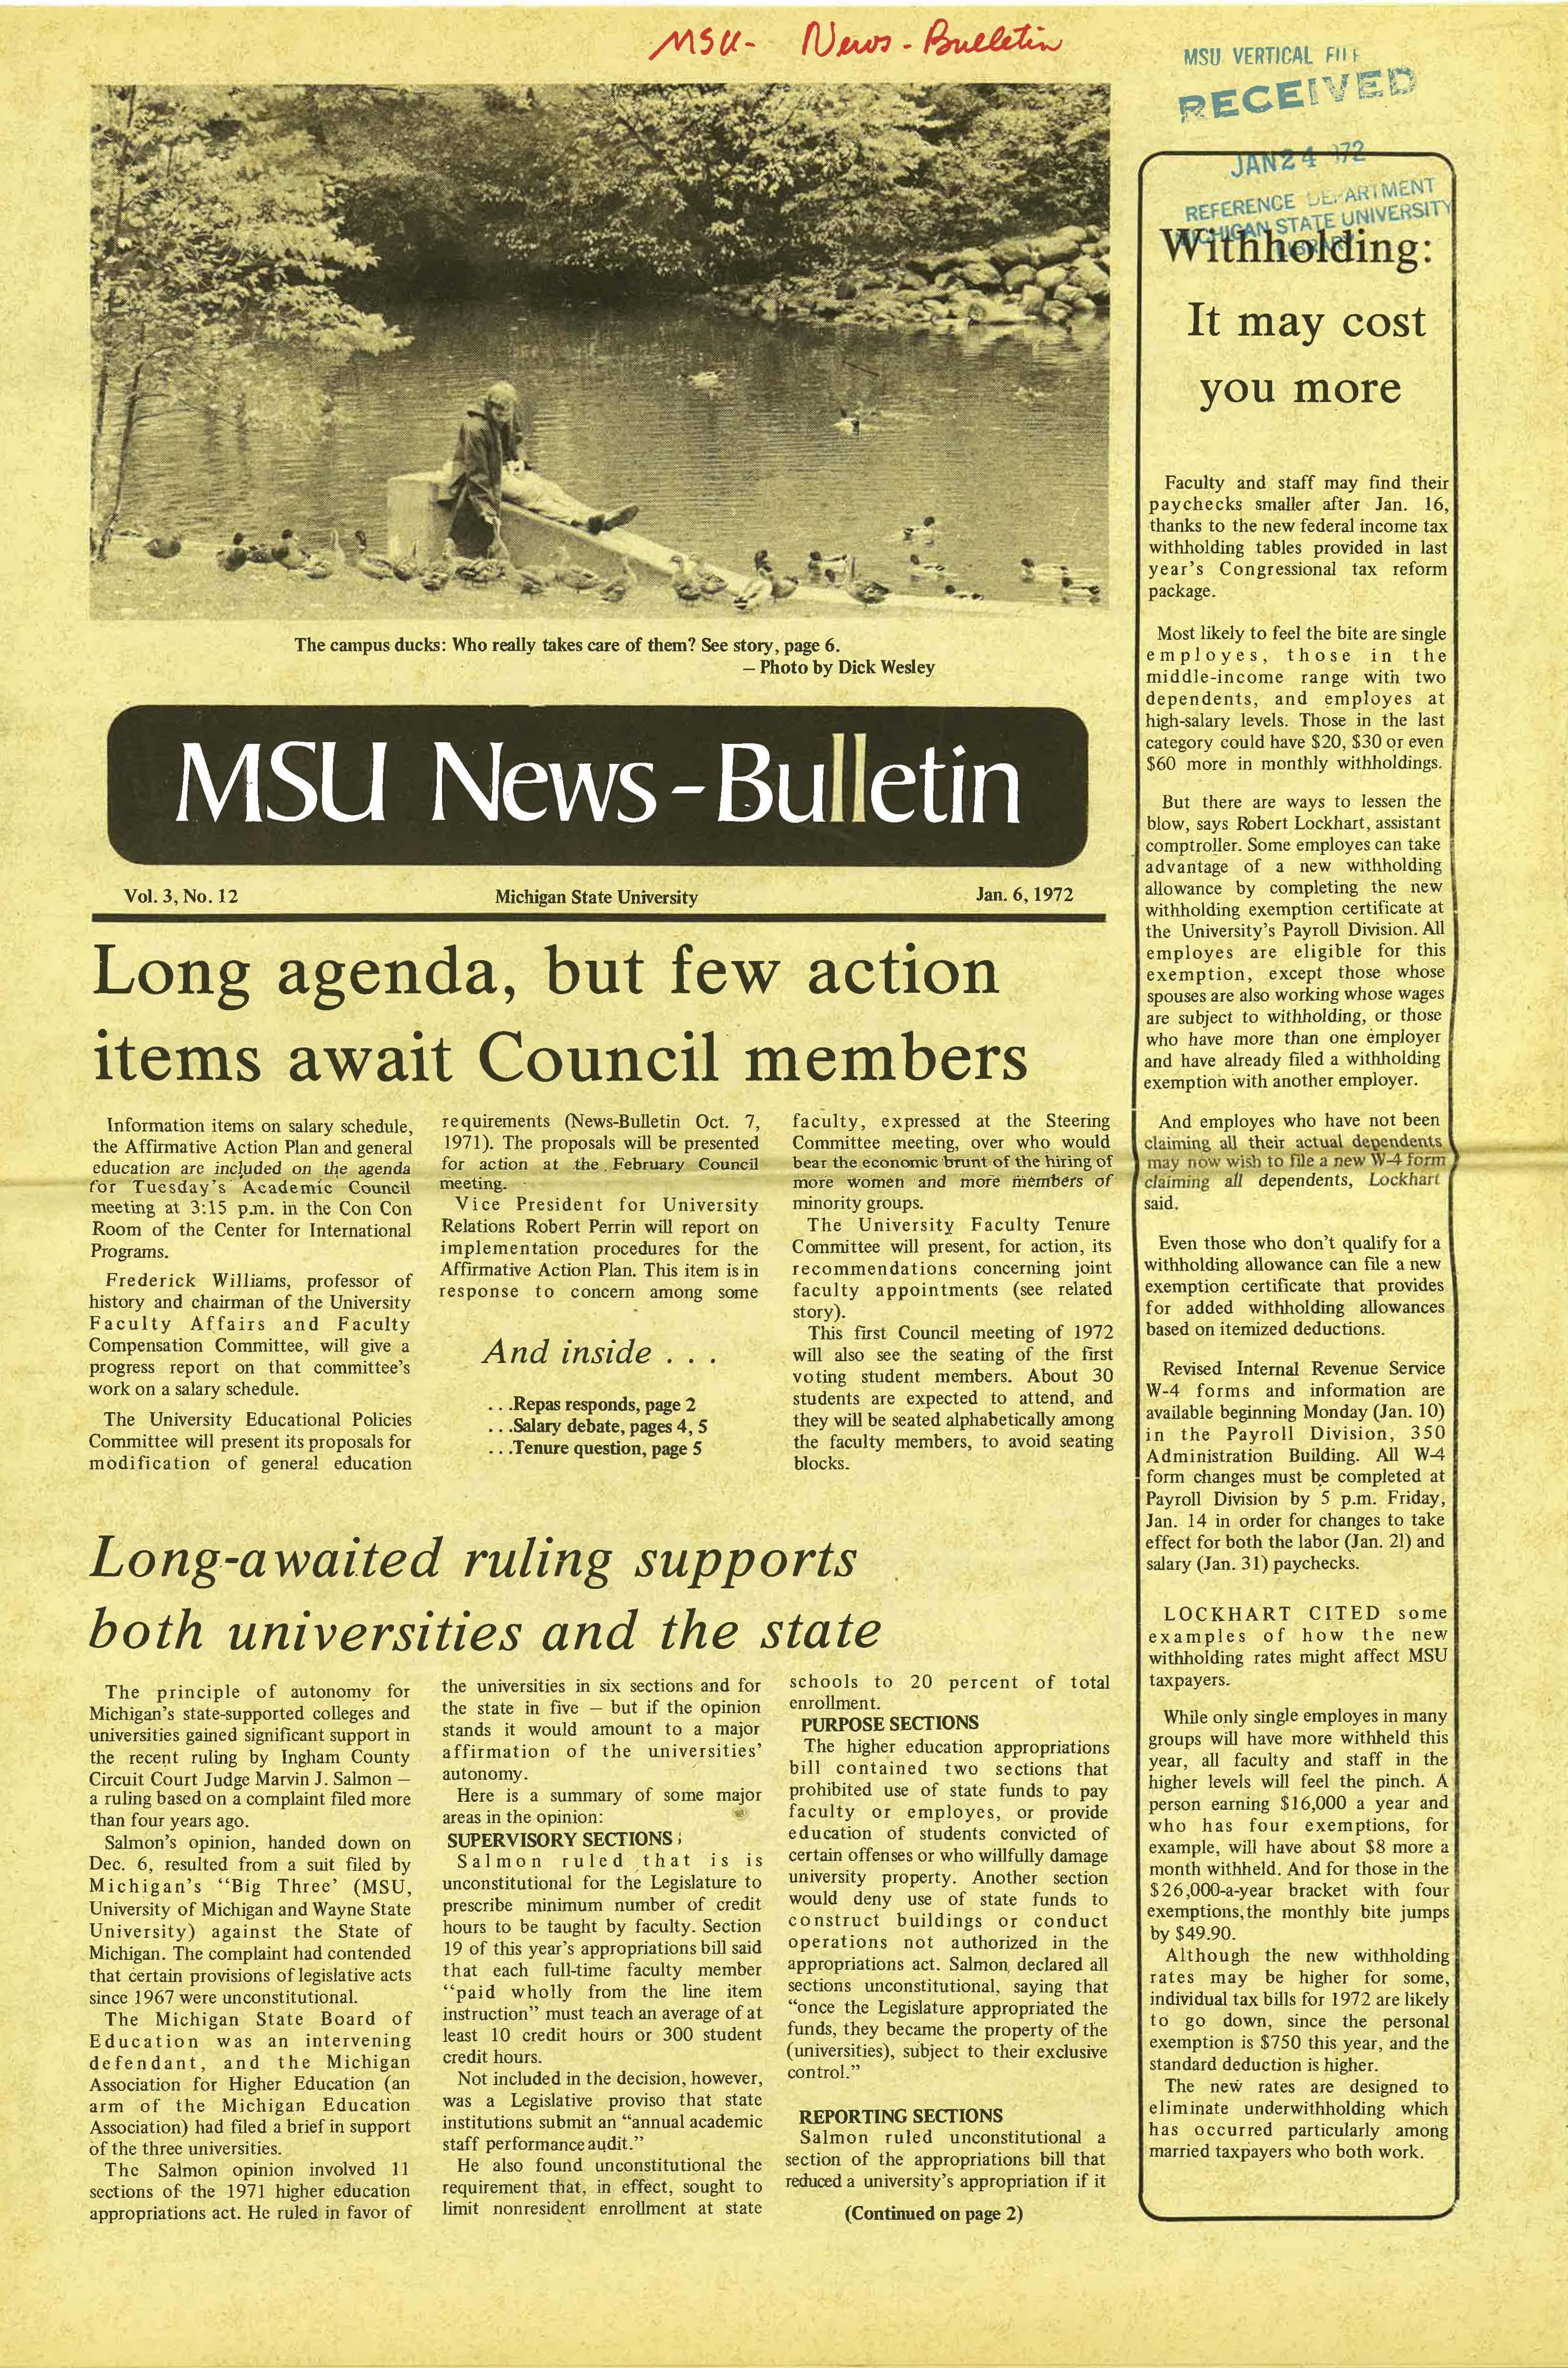 MSU News Bulletin, vol. 4, No. 04, October 12, 1972